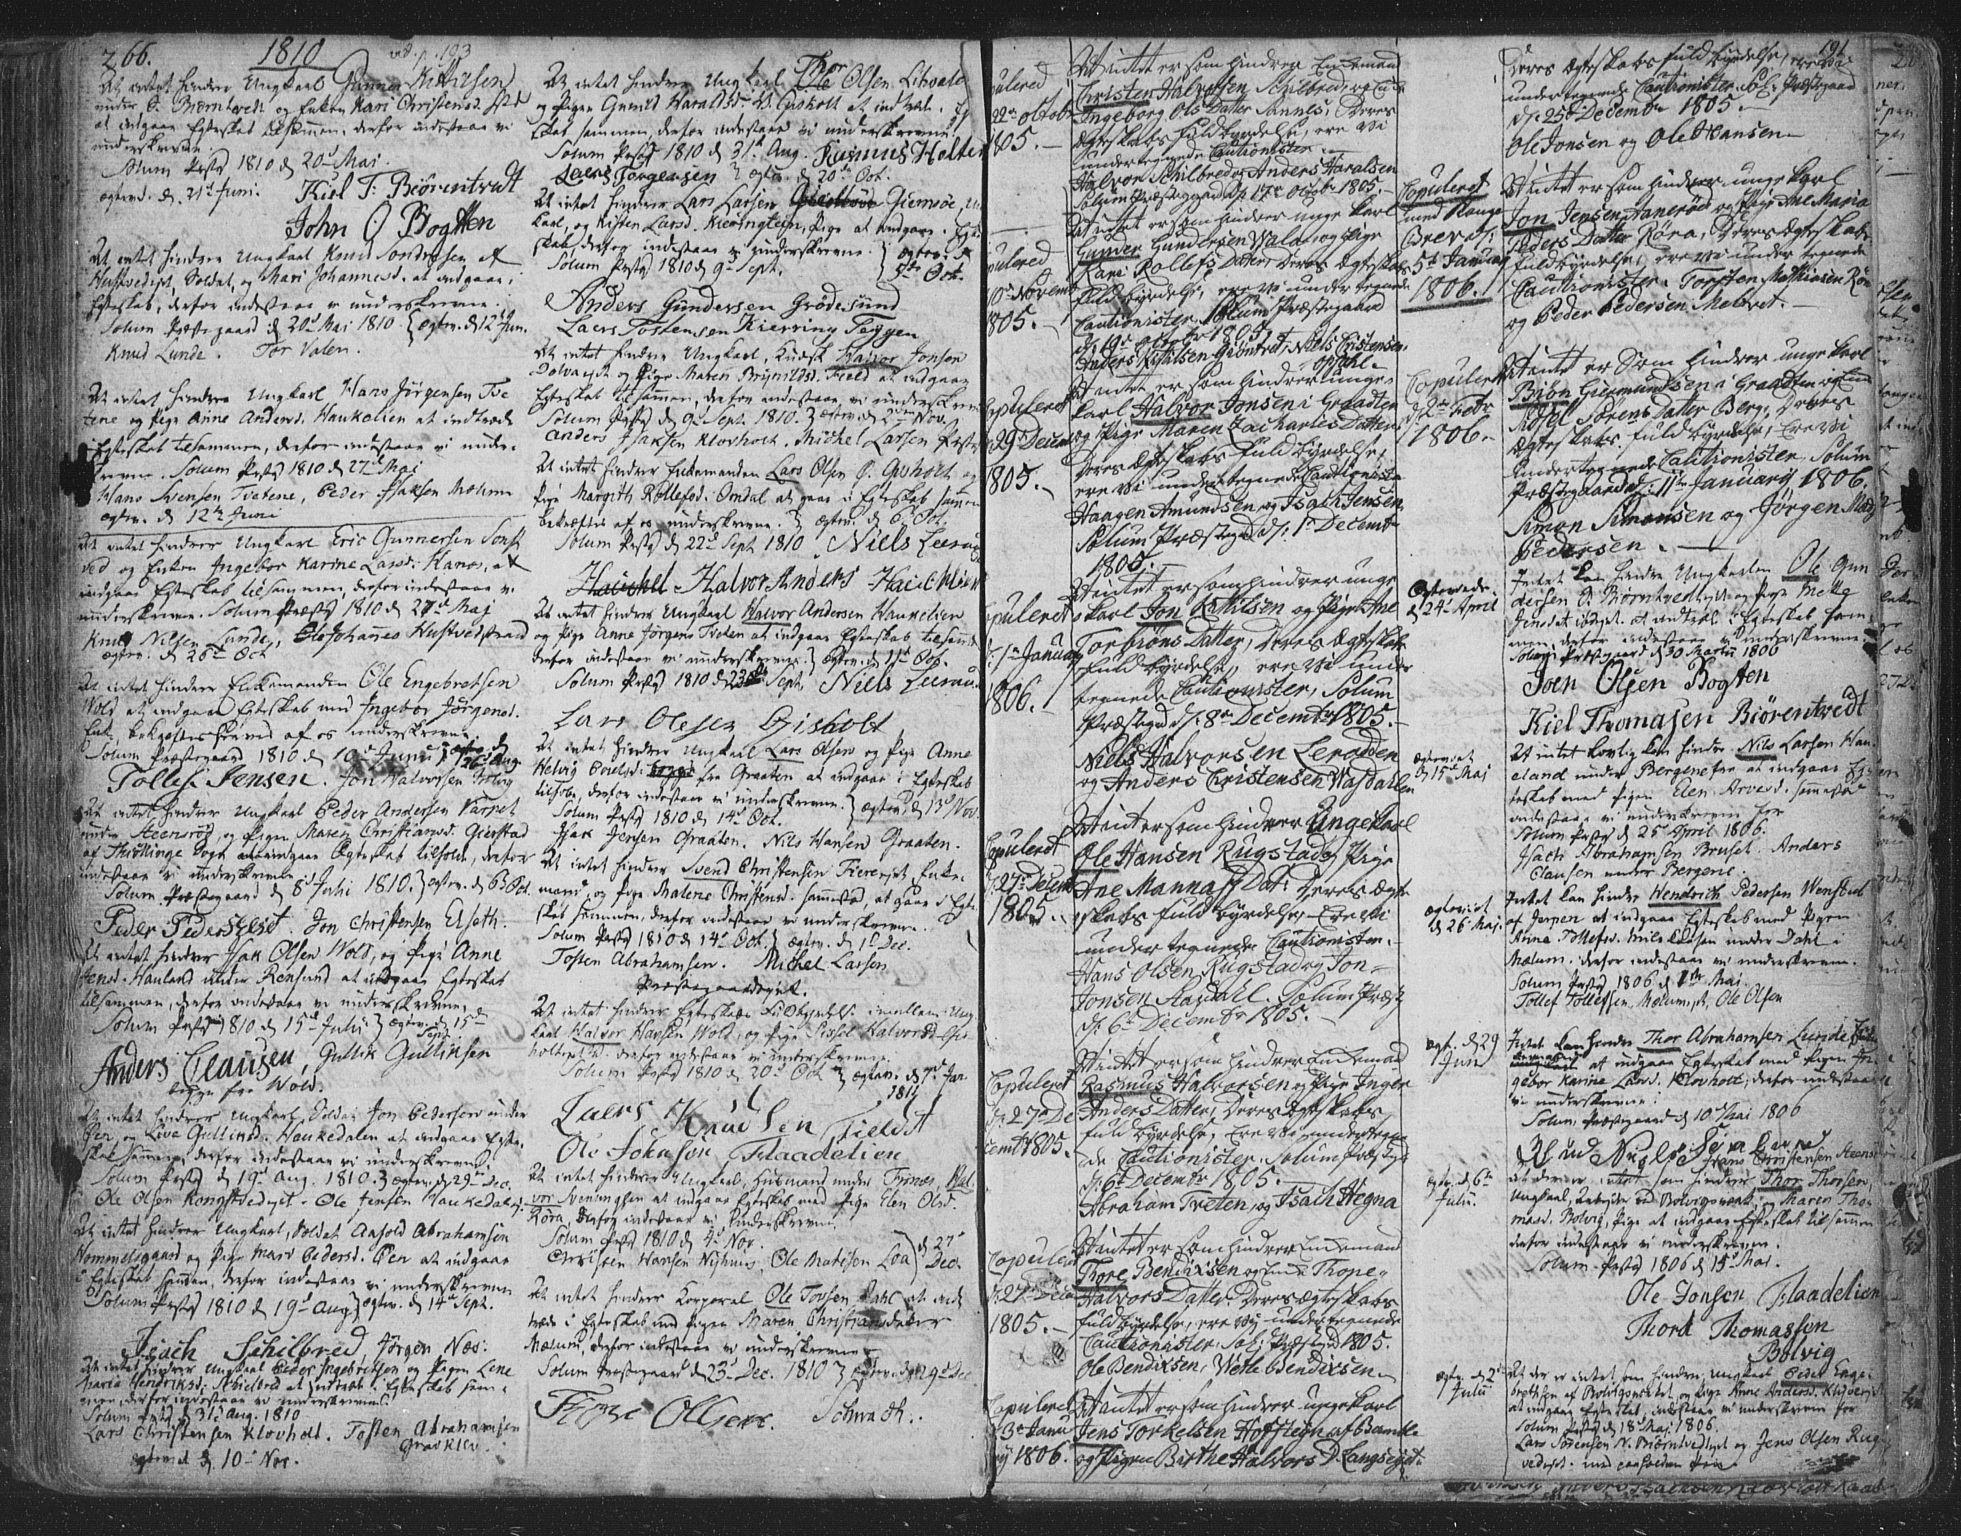 SAKO, Solum kirkebøker, F/Fa/L0003: Ministerialbok nr. I 3, 1761-1814, s. 266-191